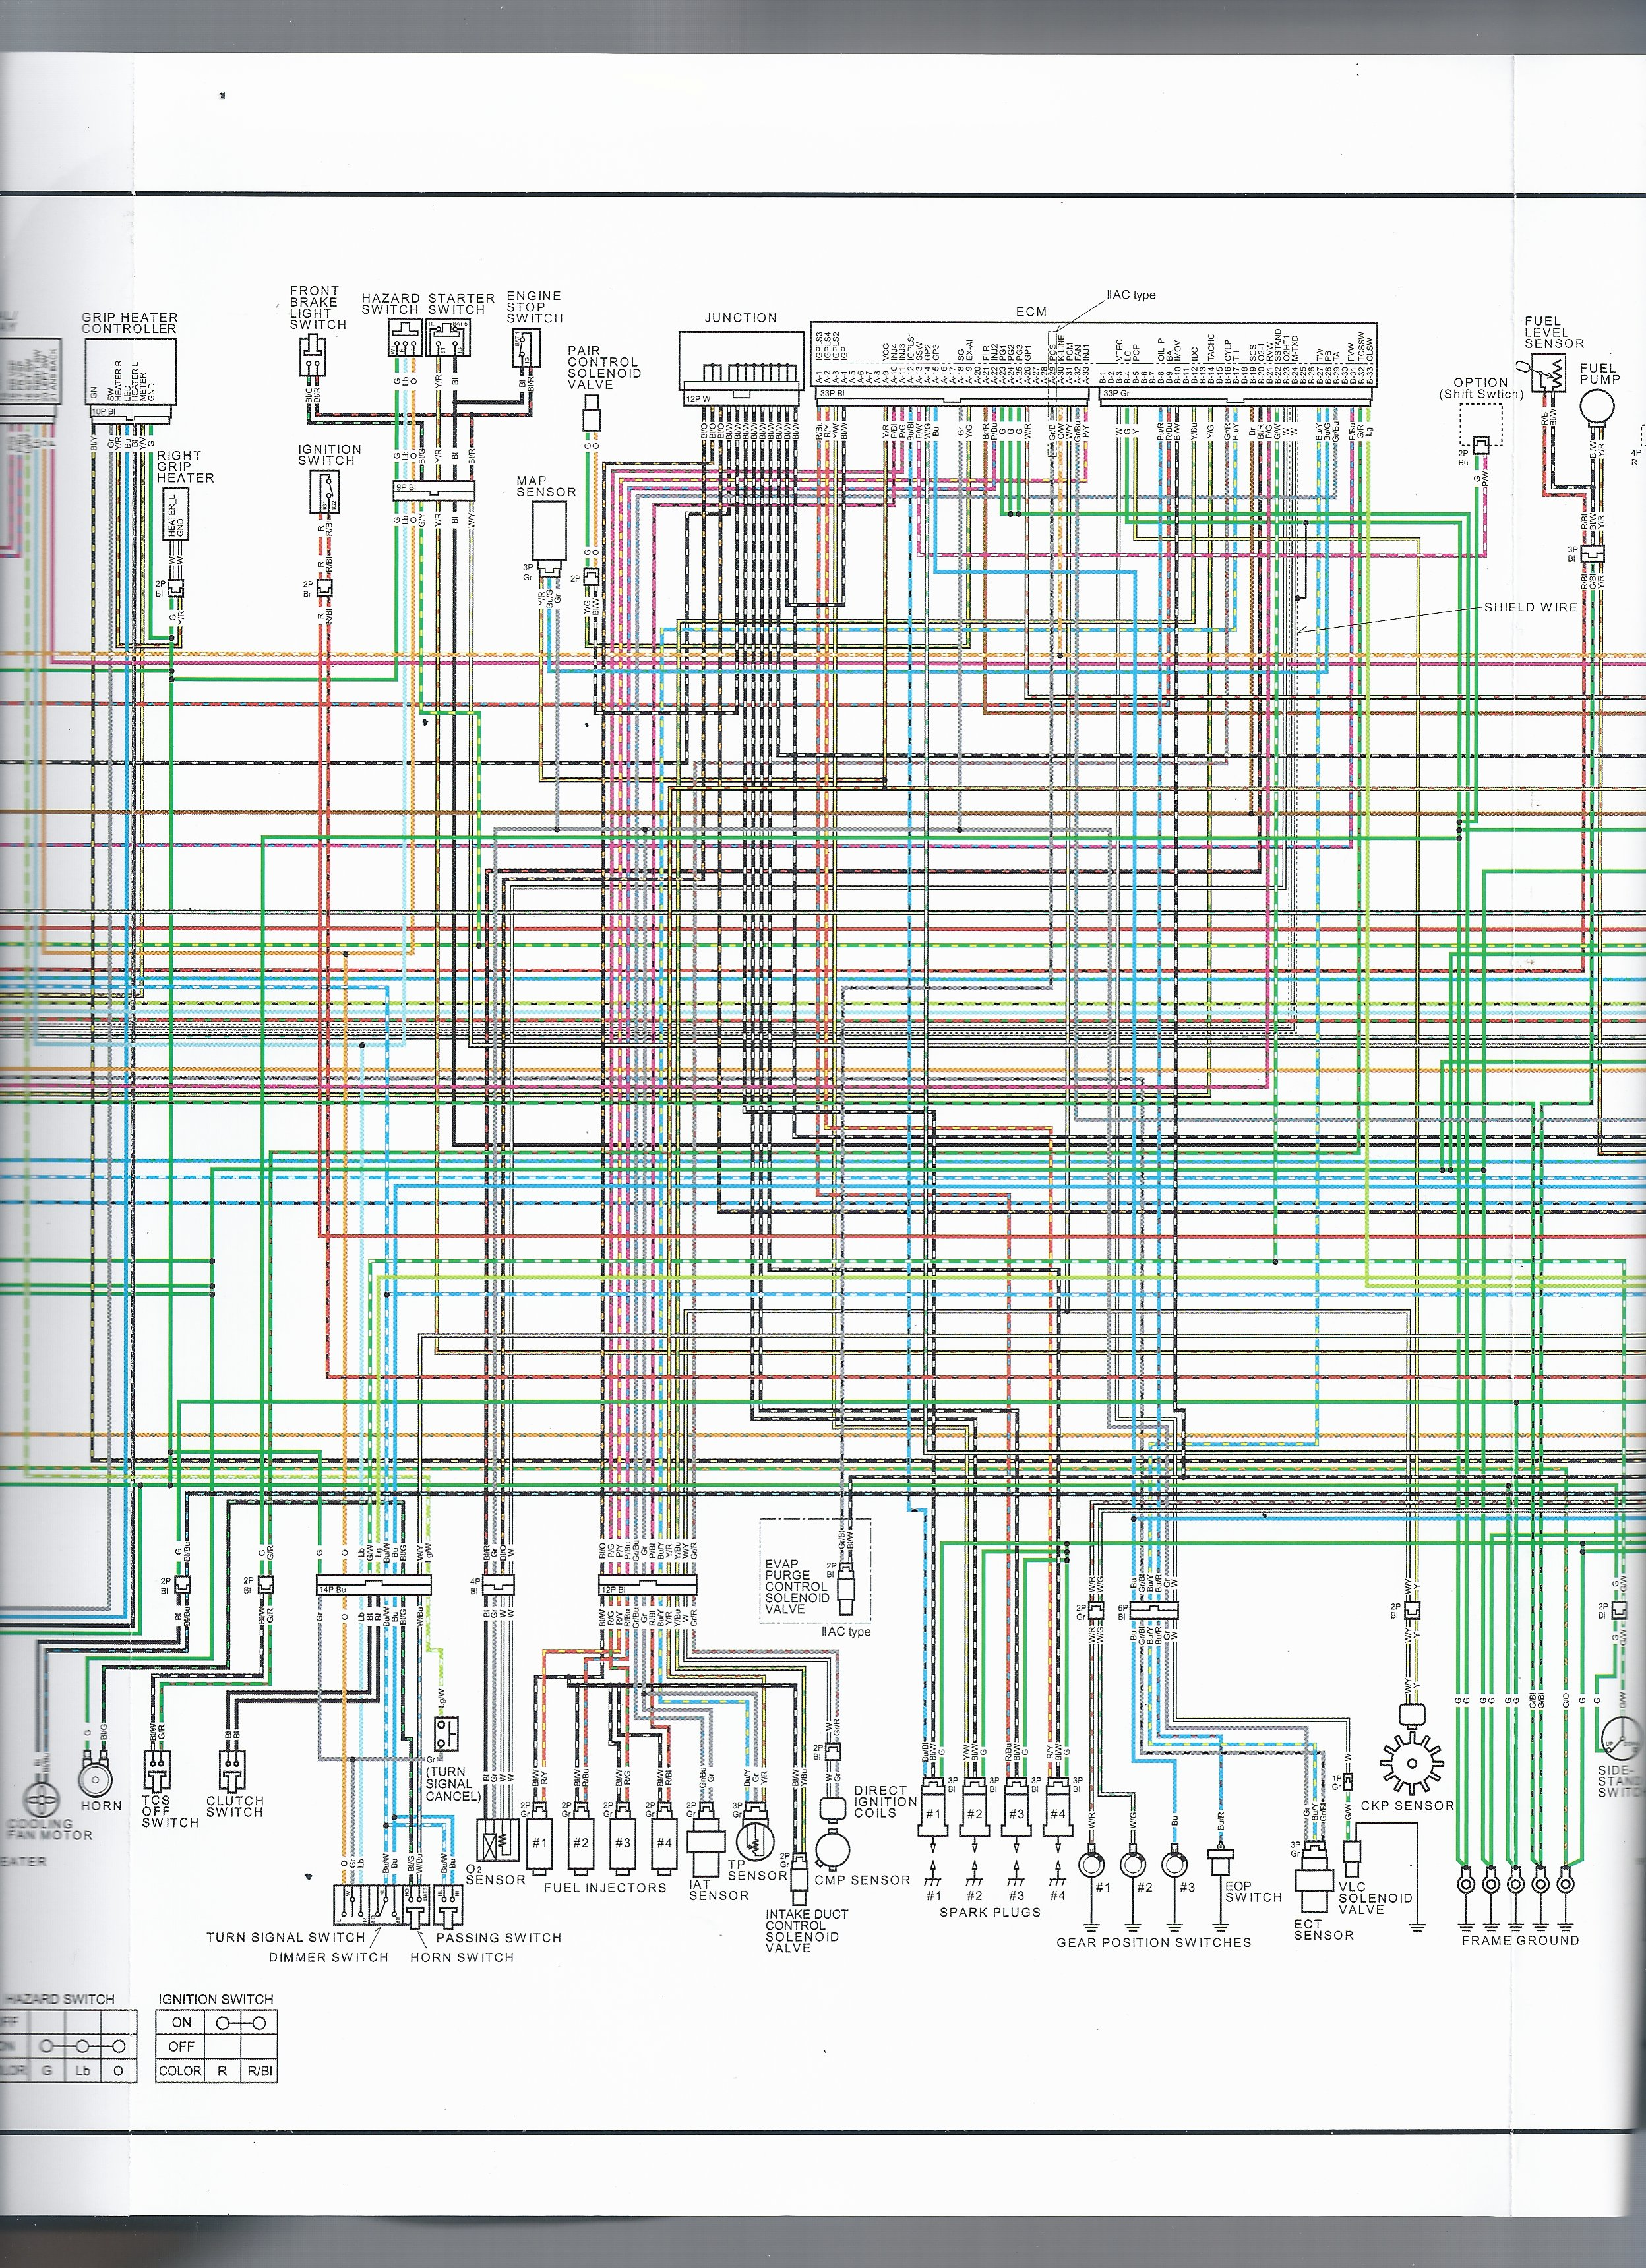 Continental Chiller Wiring Diagram Free For You Control Cabinet Electrical Rh 6 Katzen 4u De Burn Clean Hvac